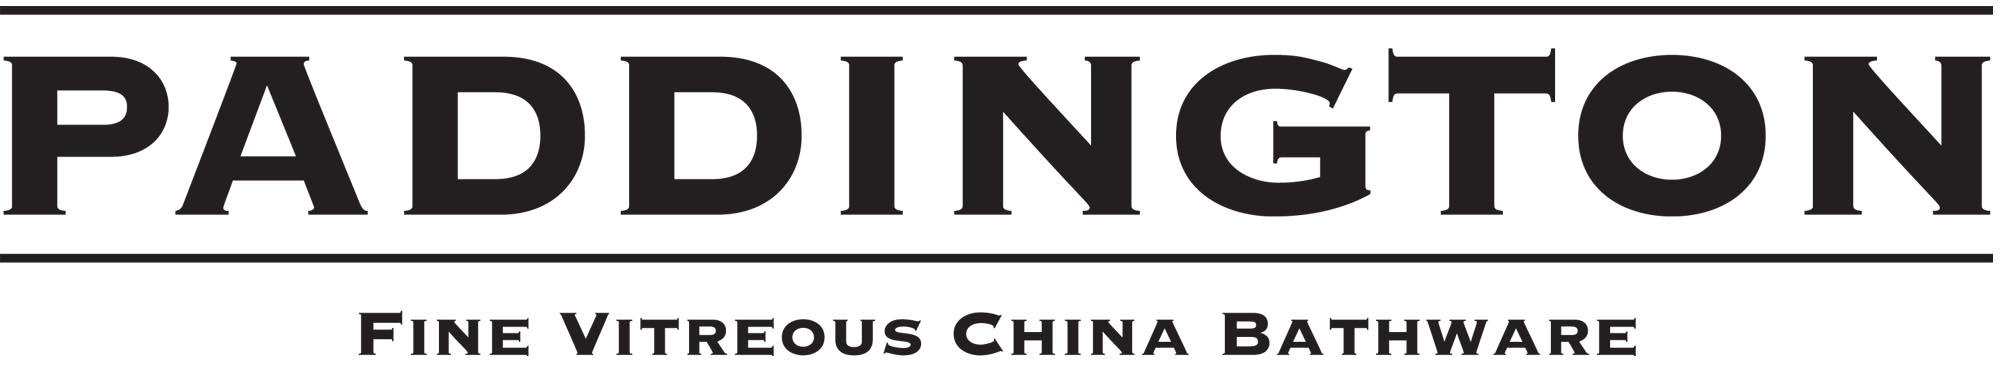 paddington-logo-banner.jpg